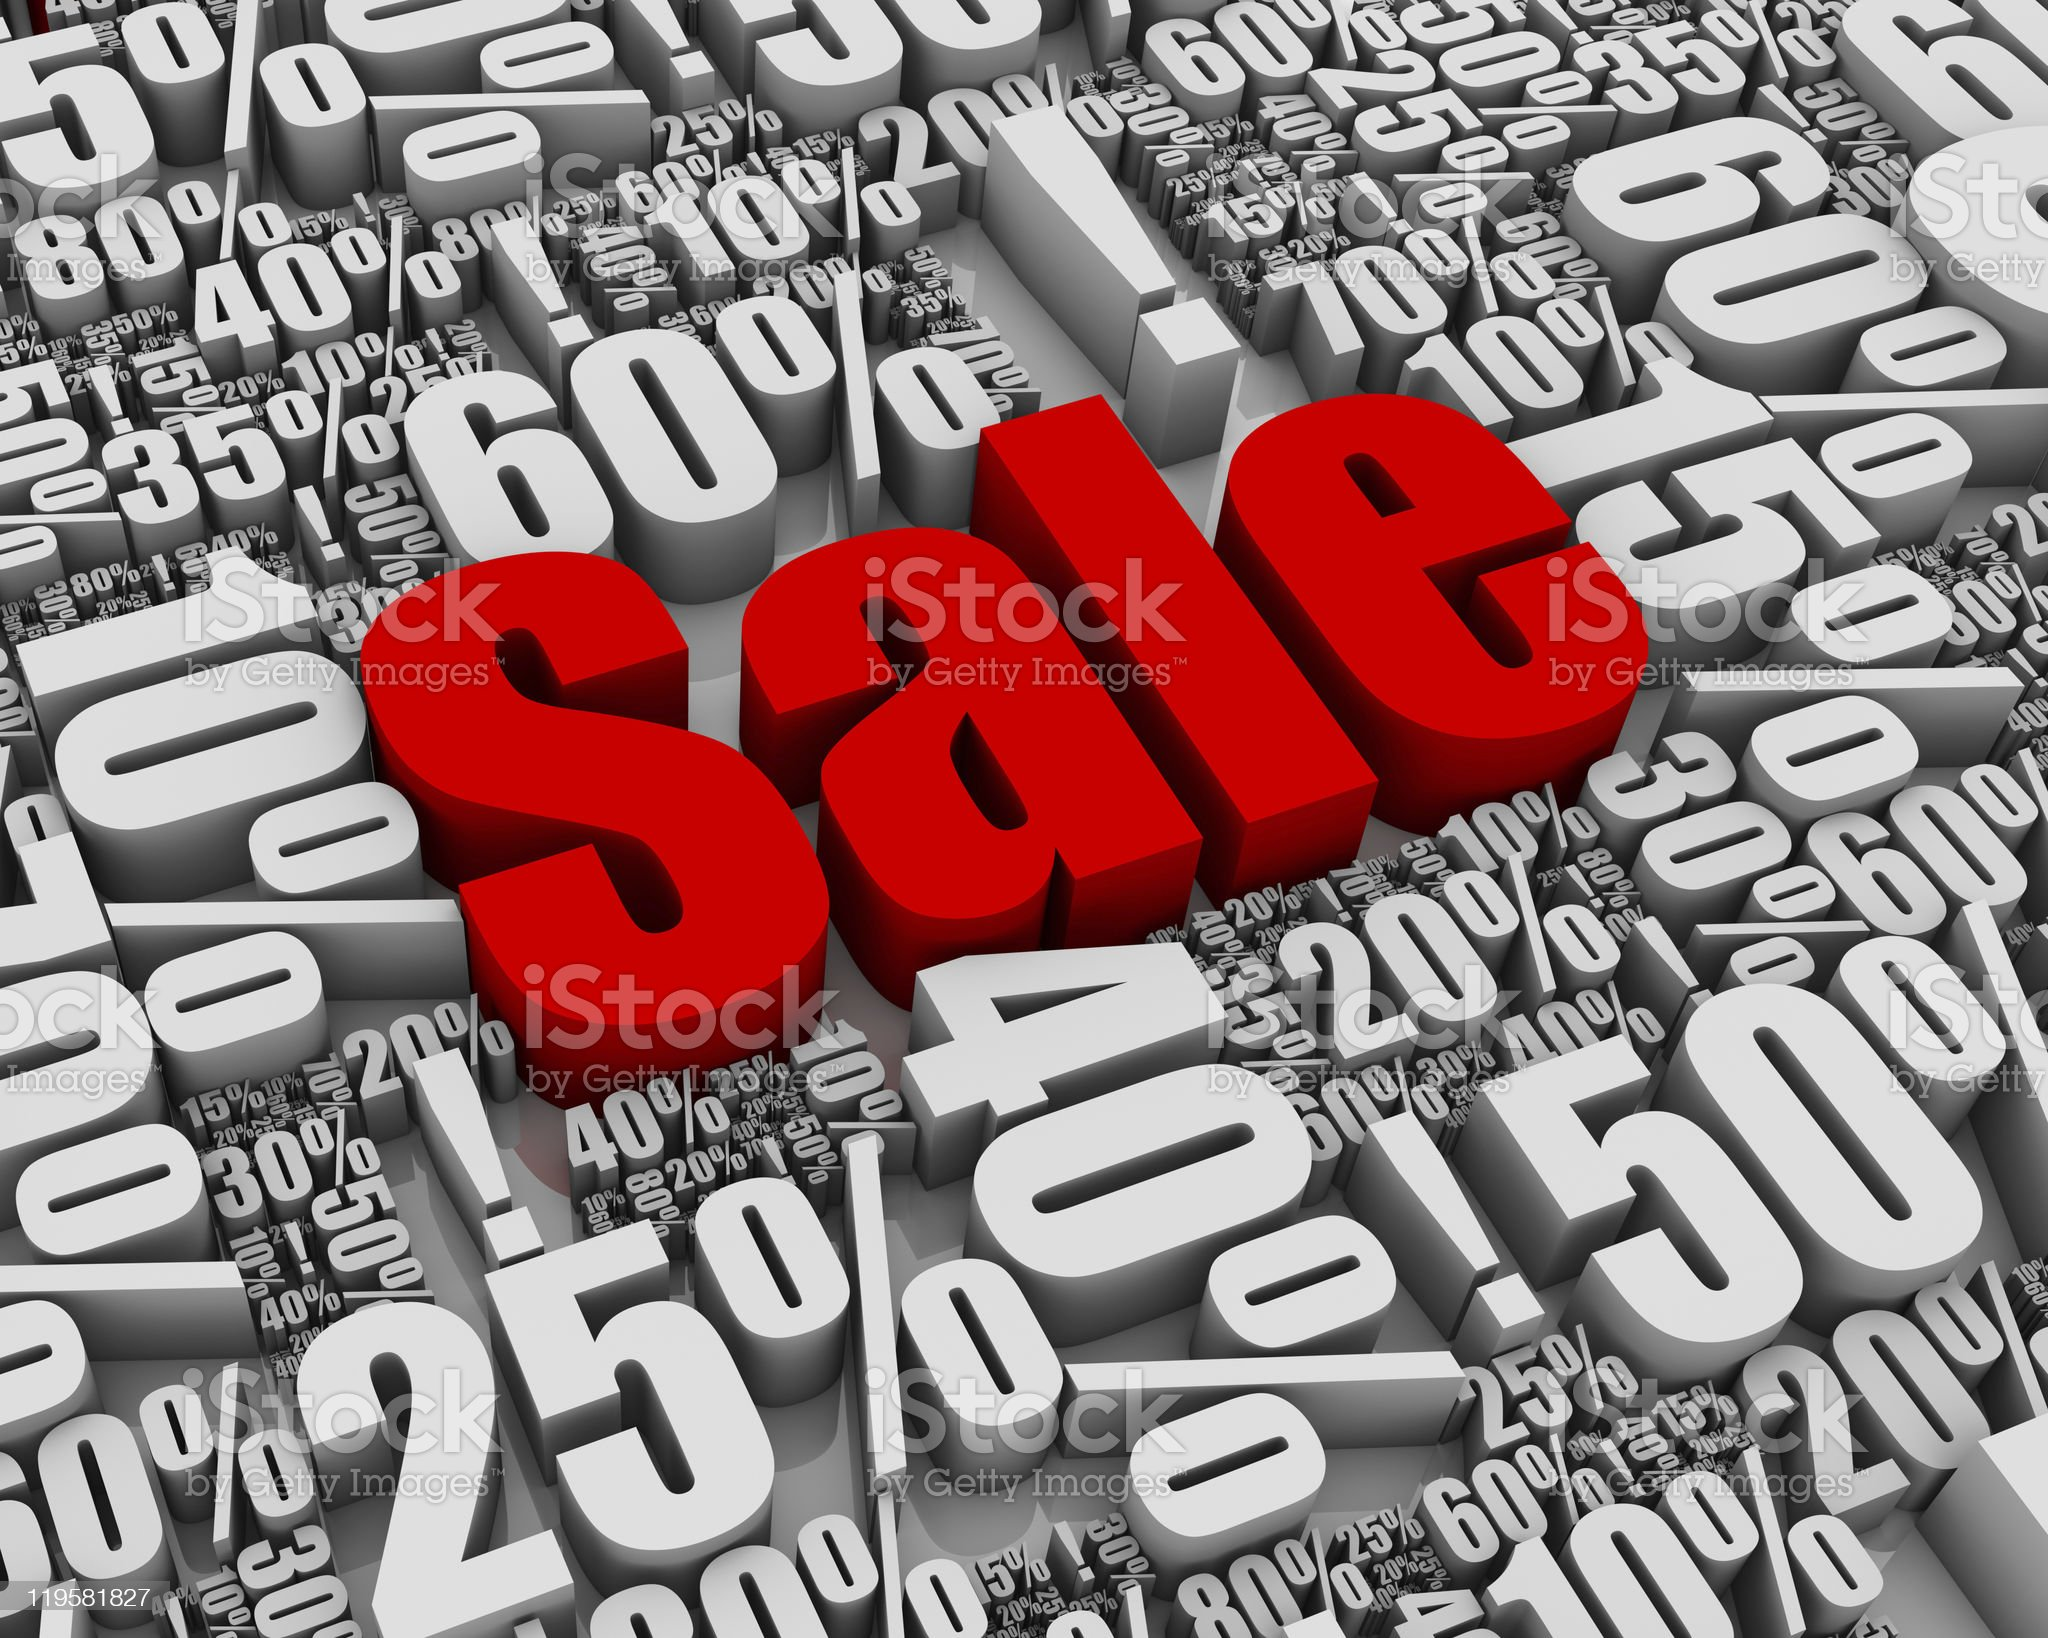 Sale! royalty-free stock photo